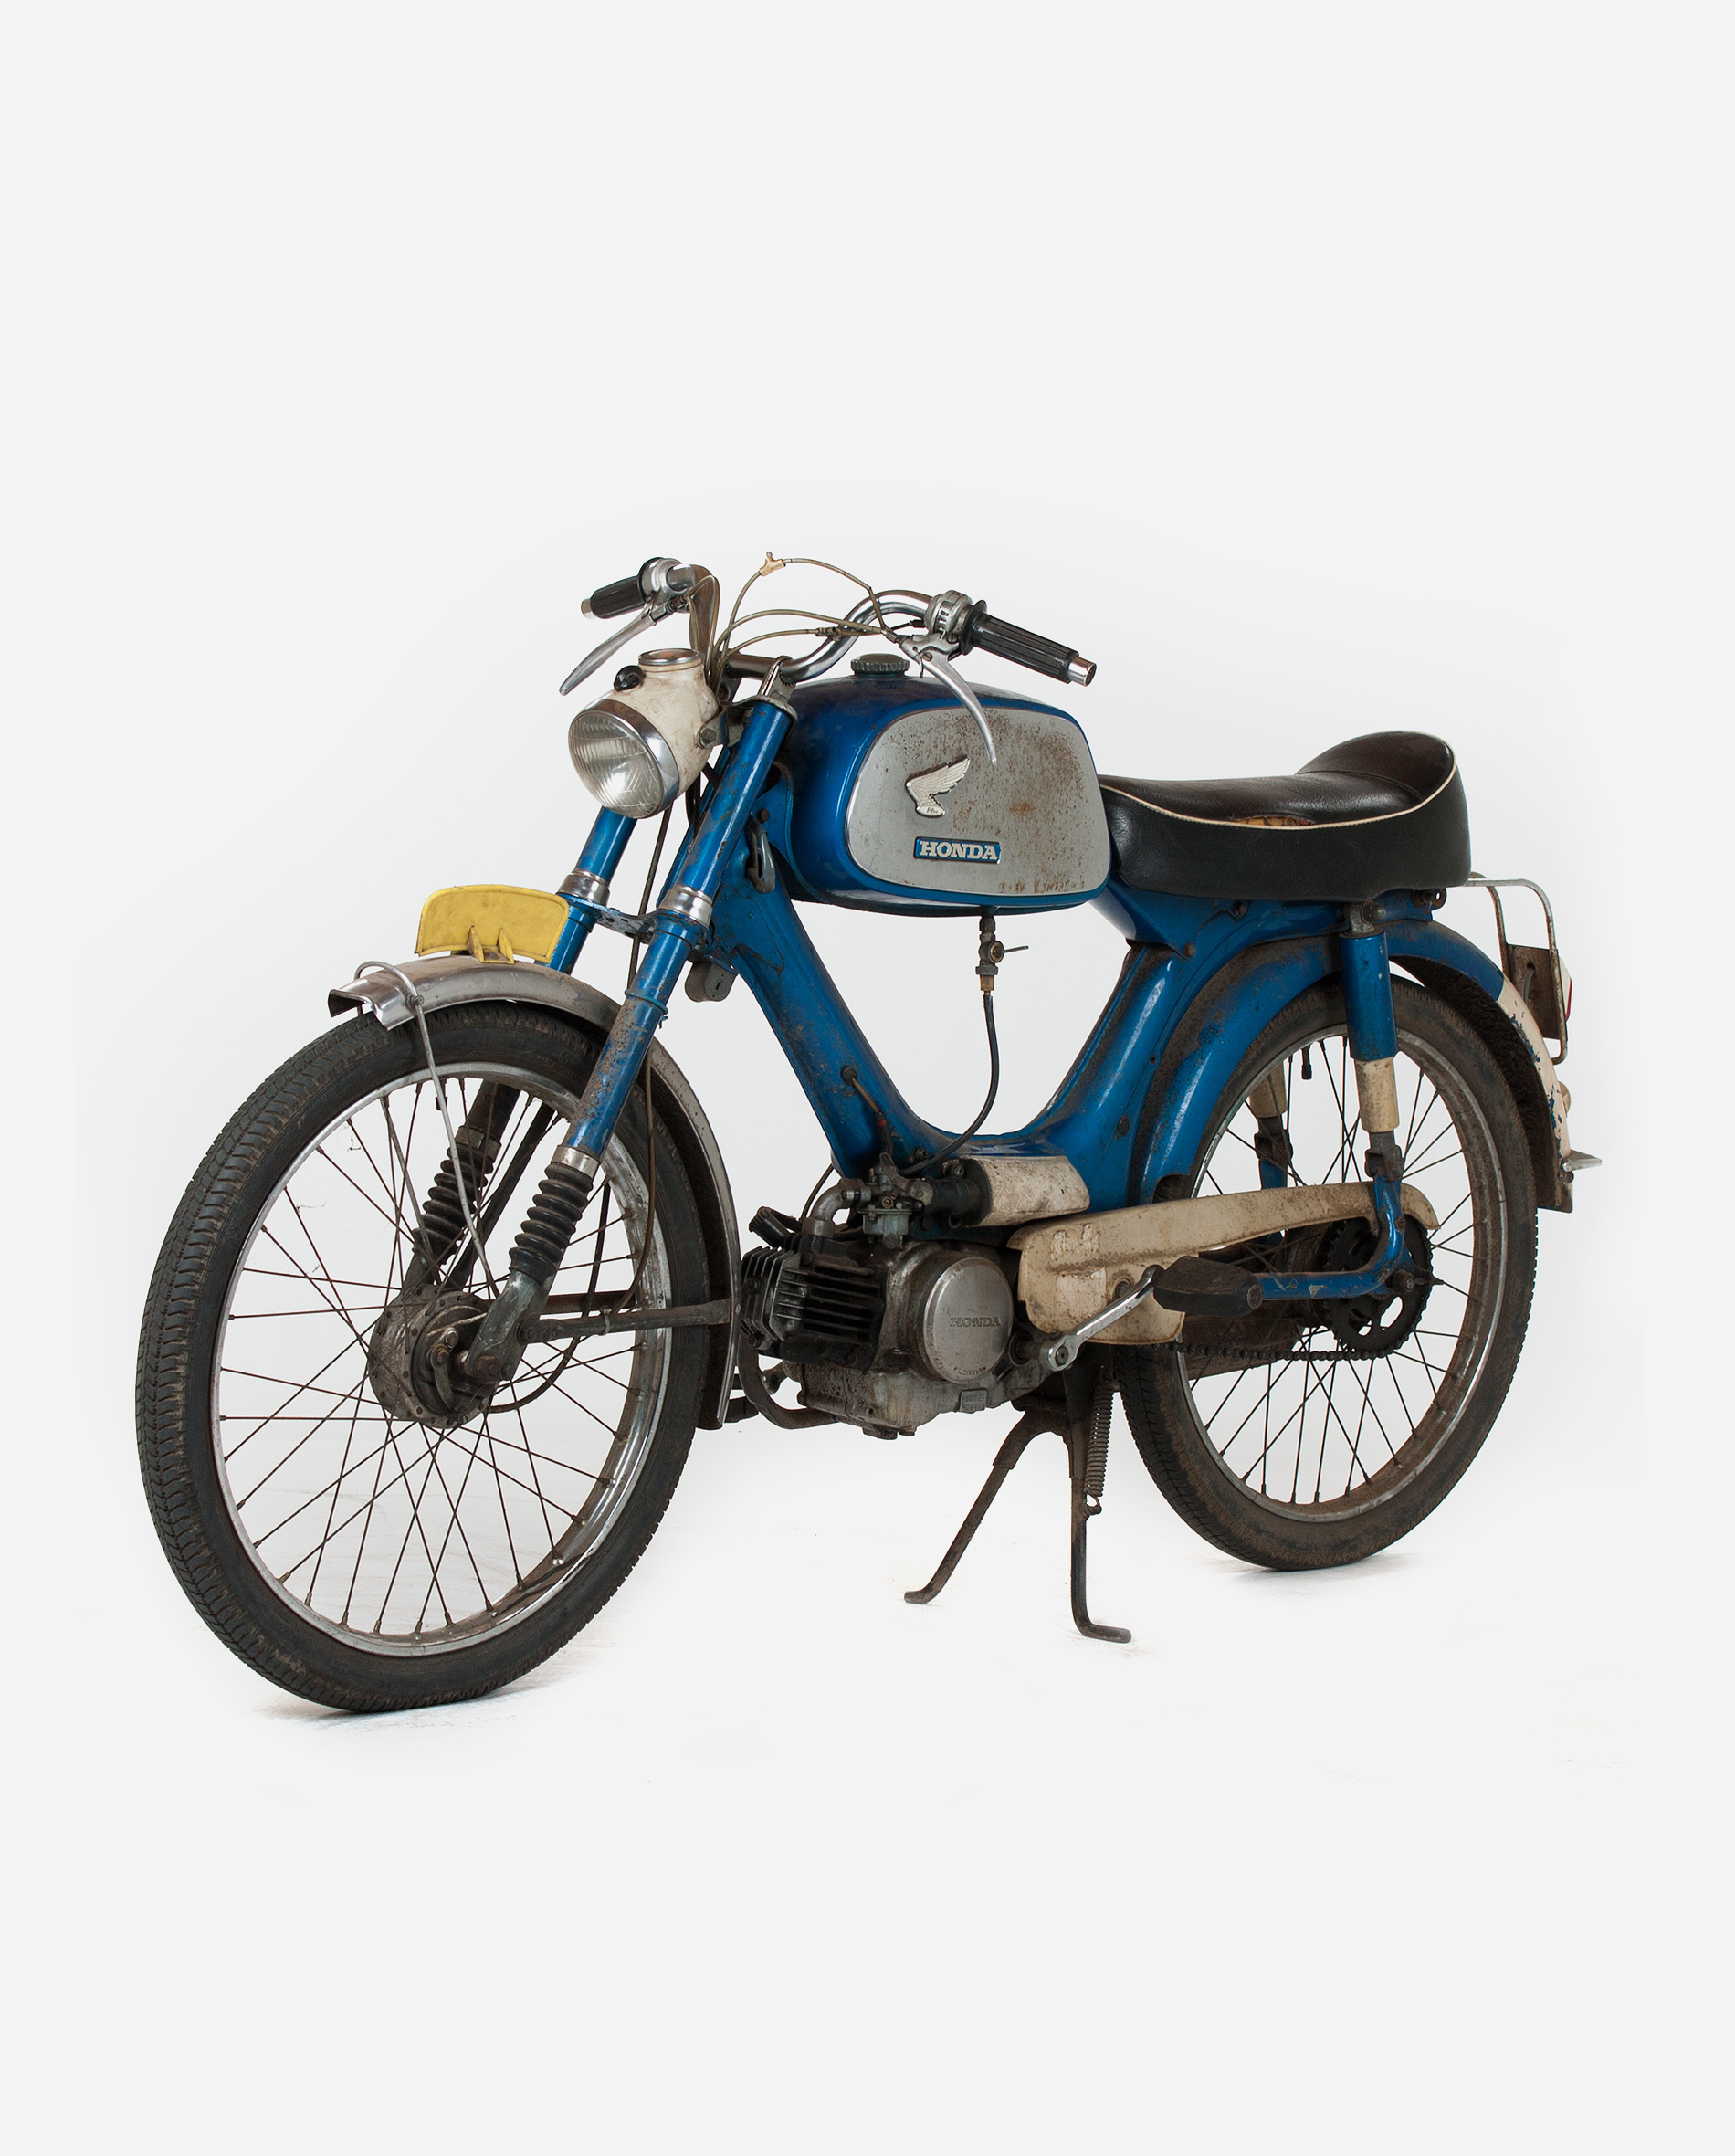 Honda-ps50-blauw-lv · Fourstrokebarn